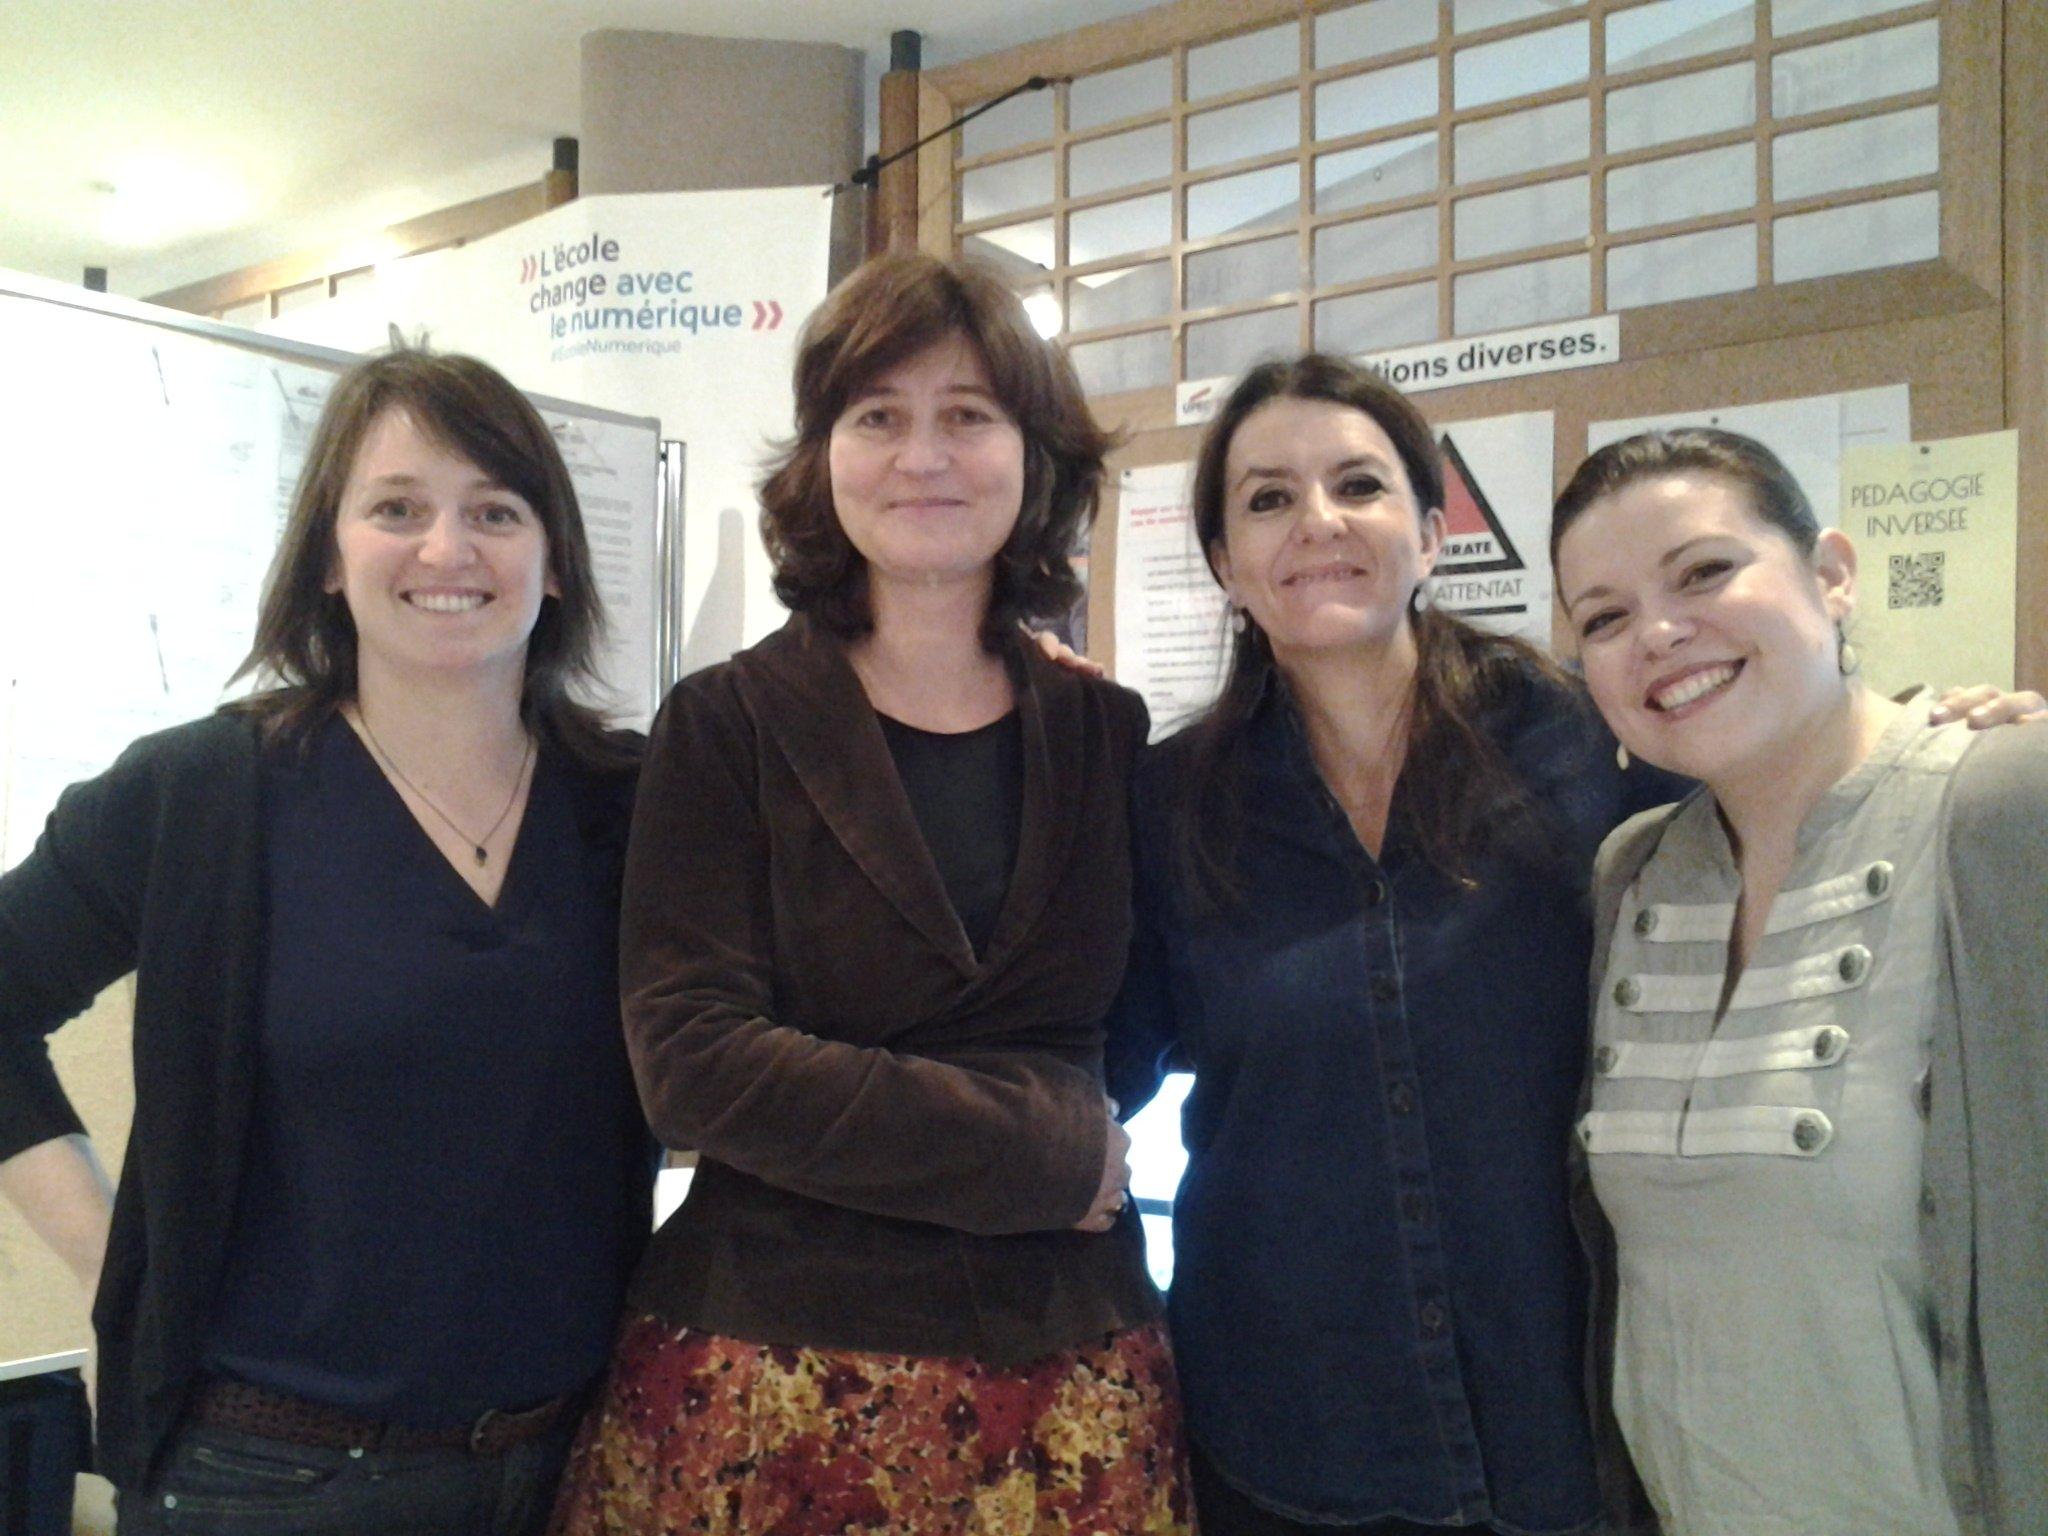 #PlanNumCreteil: des ambassadrices de charme et de choc pour #classeinversee @saule_dane94 @spepinvilar @NARI_DANE94 https://t.co/oDUDBKllka